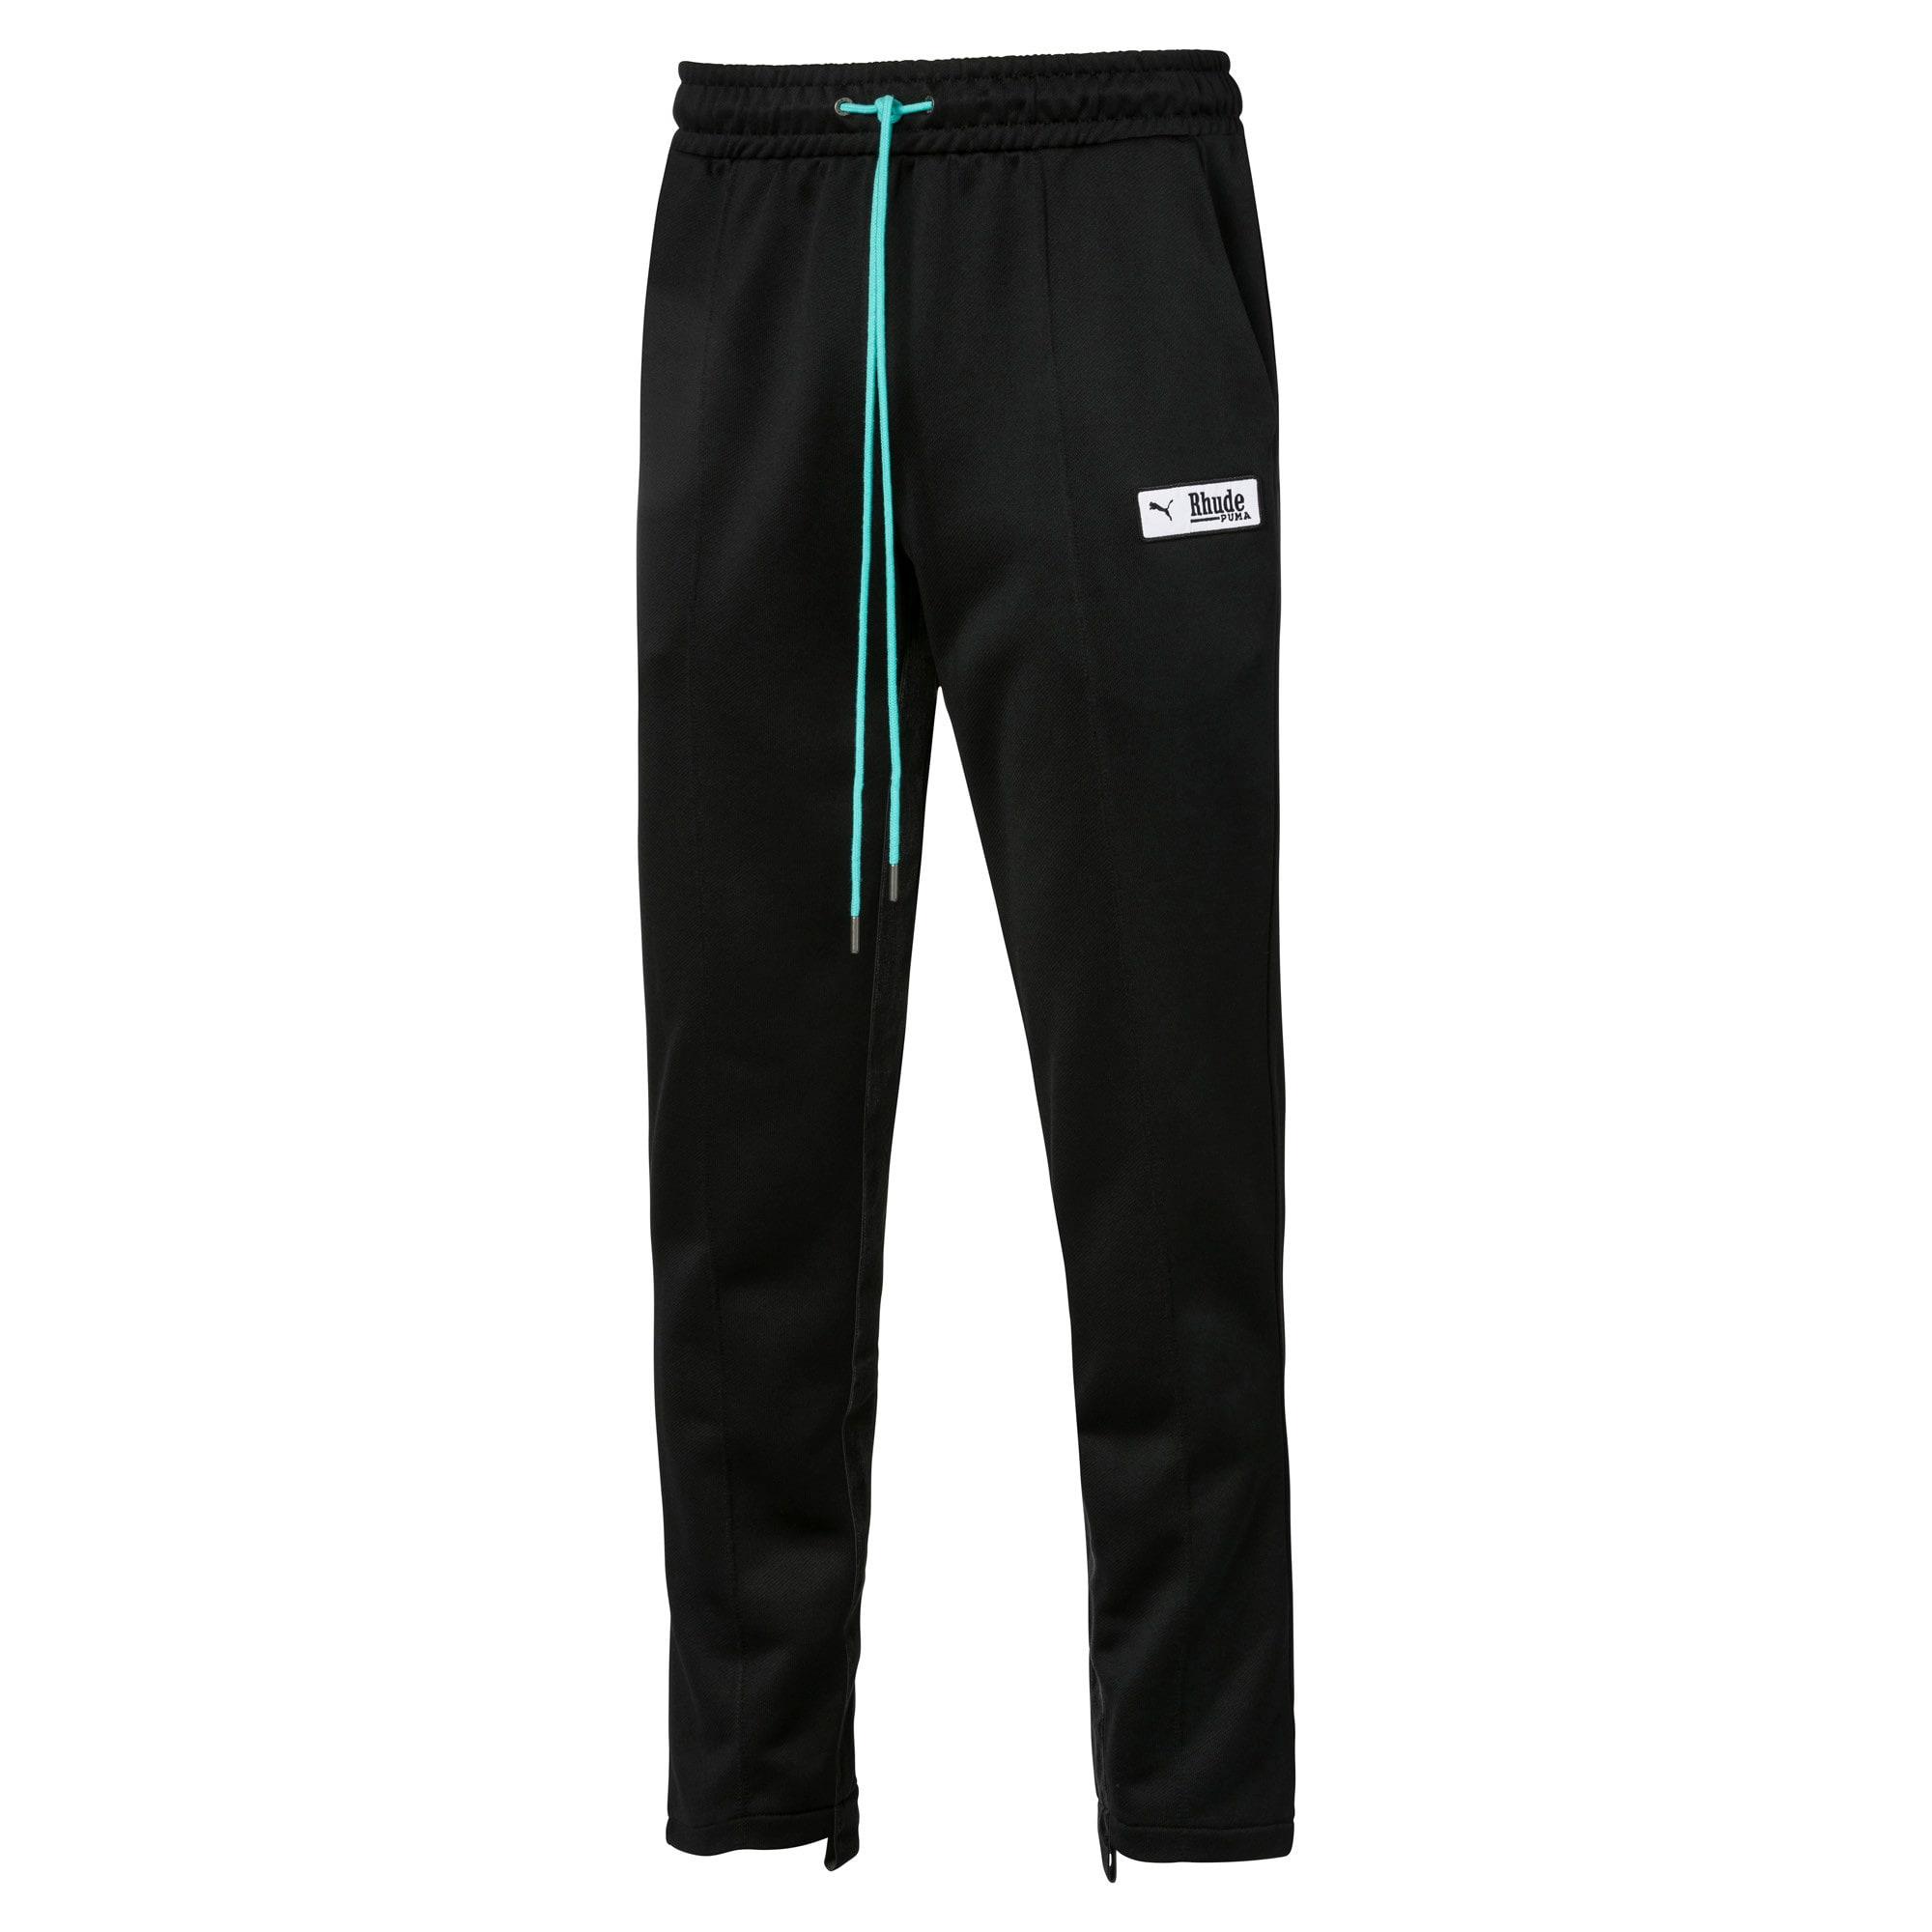 Anteprima 1 di PUMA x RHUDE Knitted Men's Track Pants, Puma Black, medio